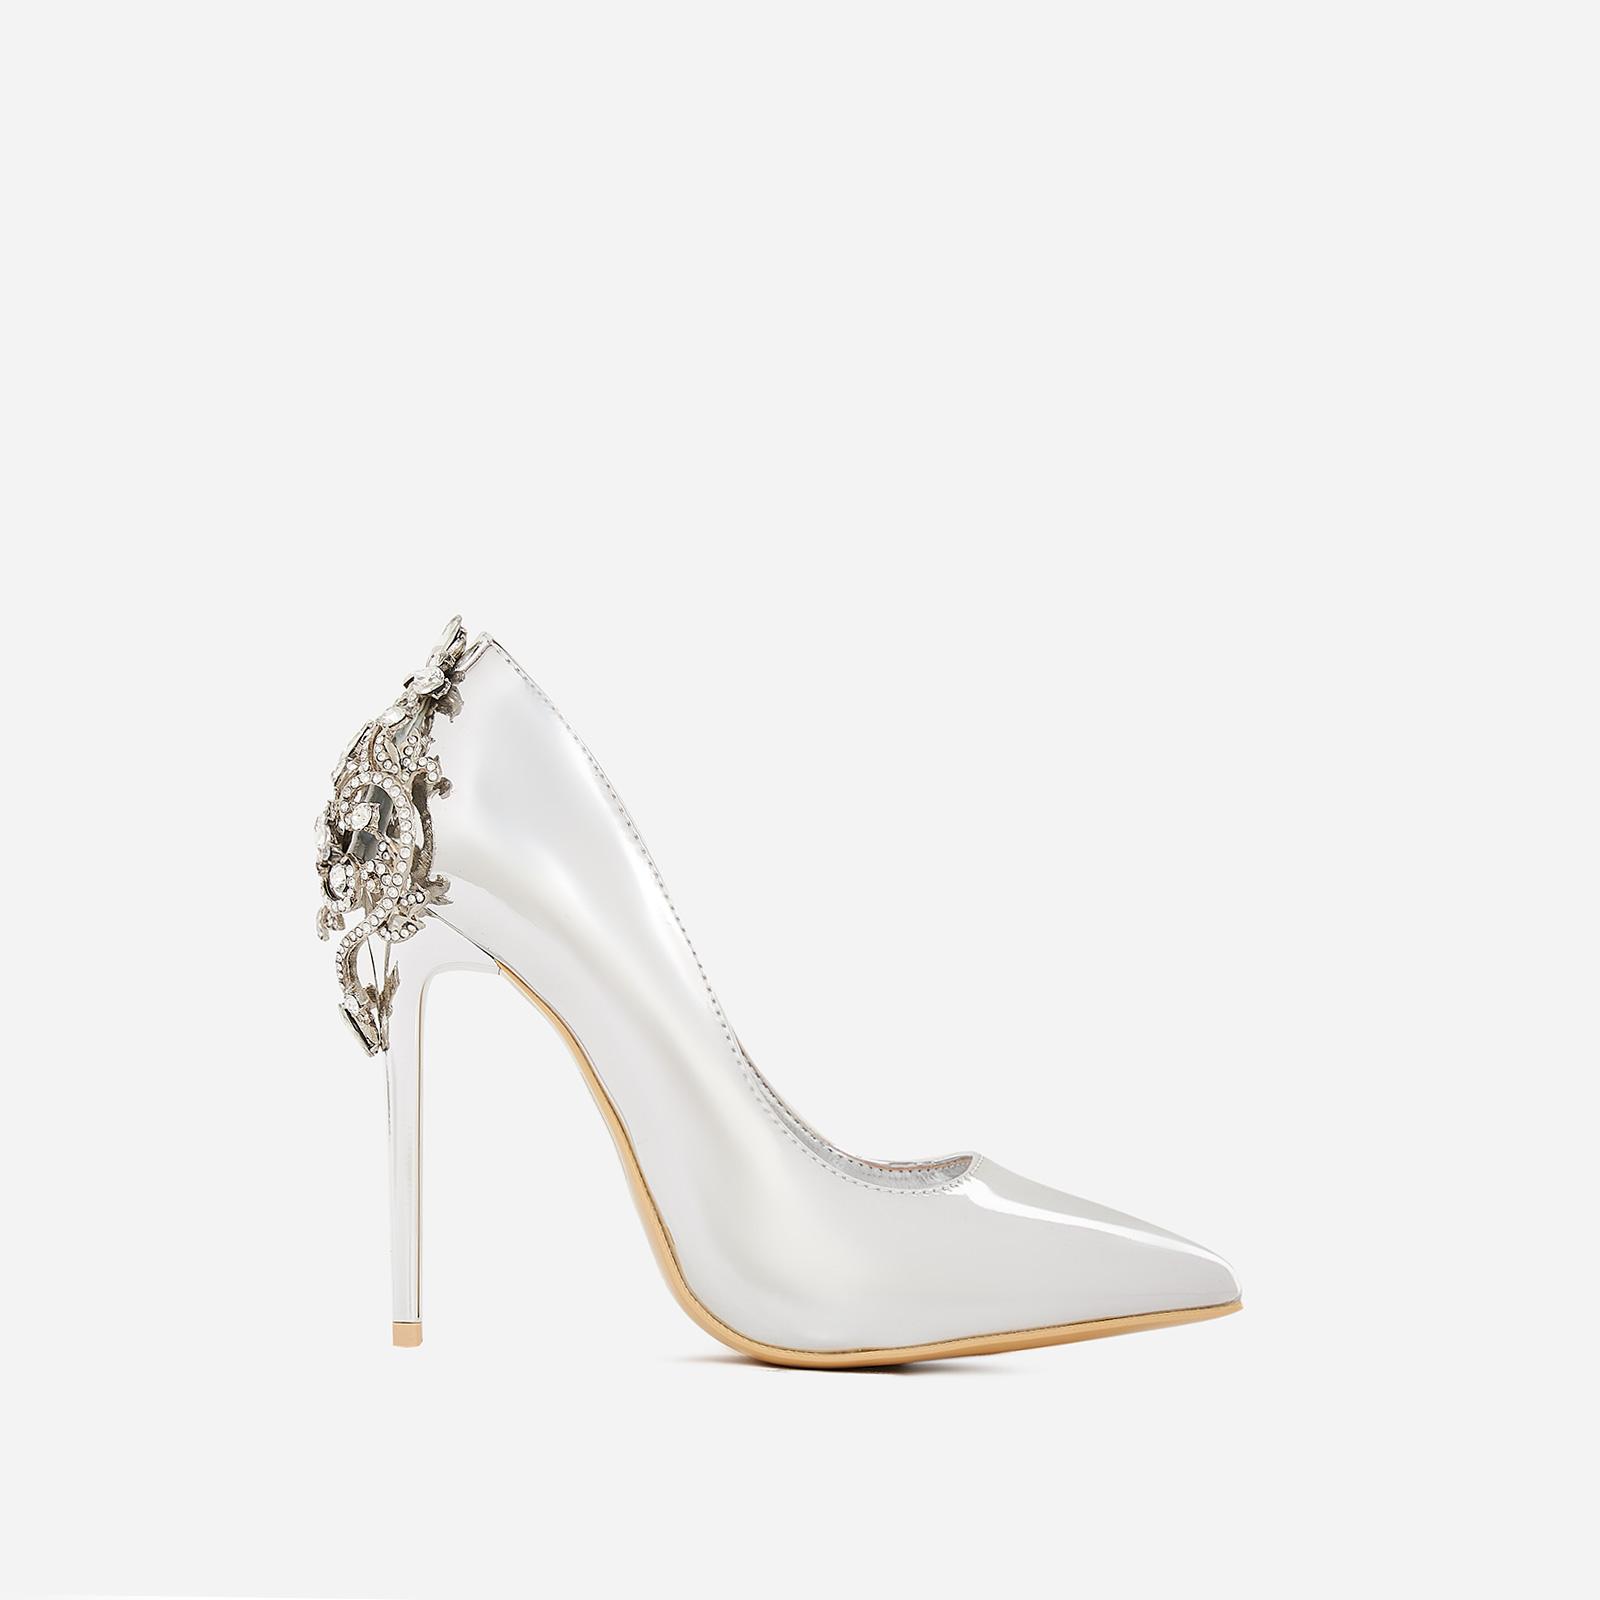 Aries Jewel Embellished Court Heel In Metallic Silver Patent